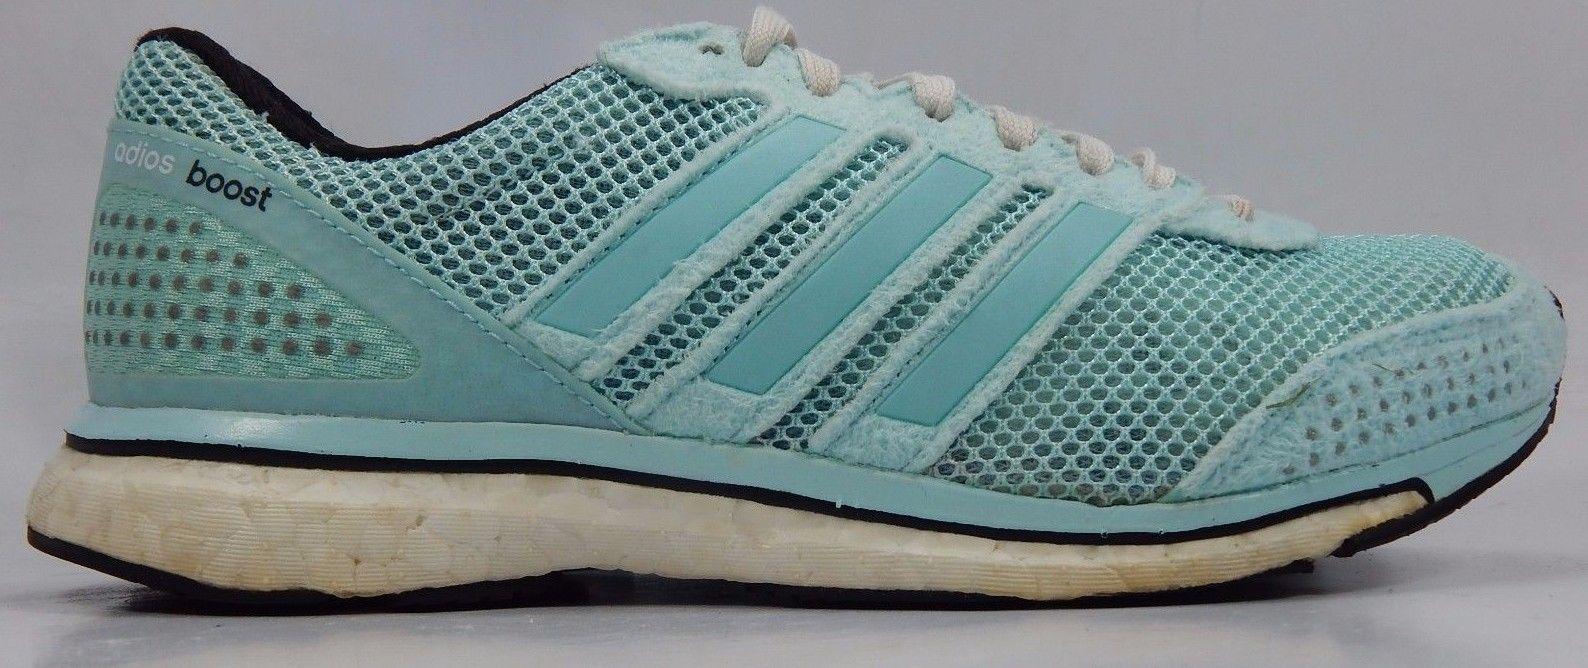 ADIDAS ADIZERO ADIOS BOOST 2 WOMEN'S RUNNING SHOES SZ US 6 M (B) EU 37 1/3 BLUE